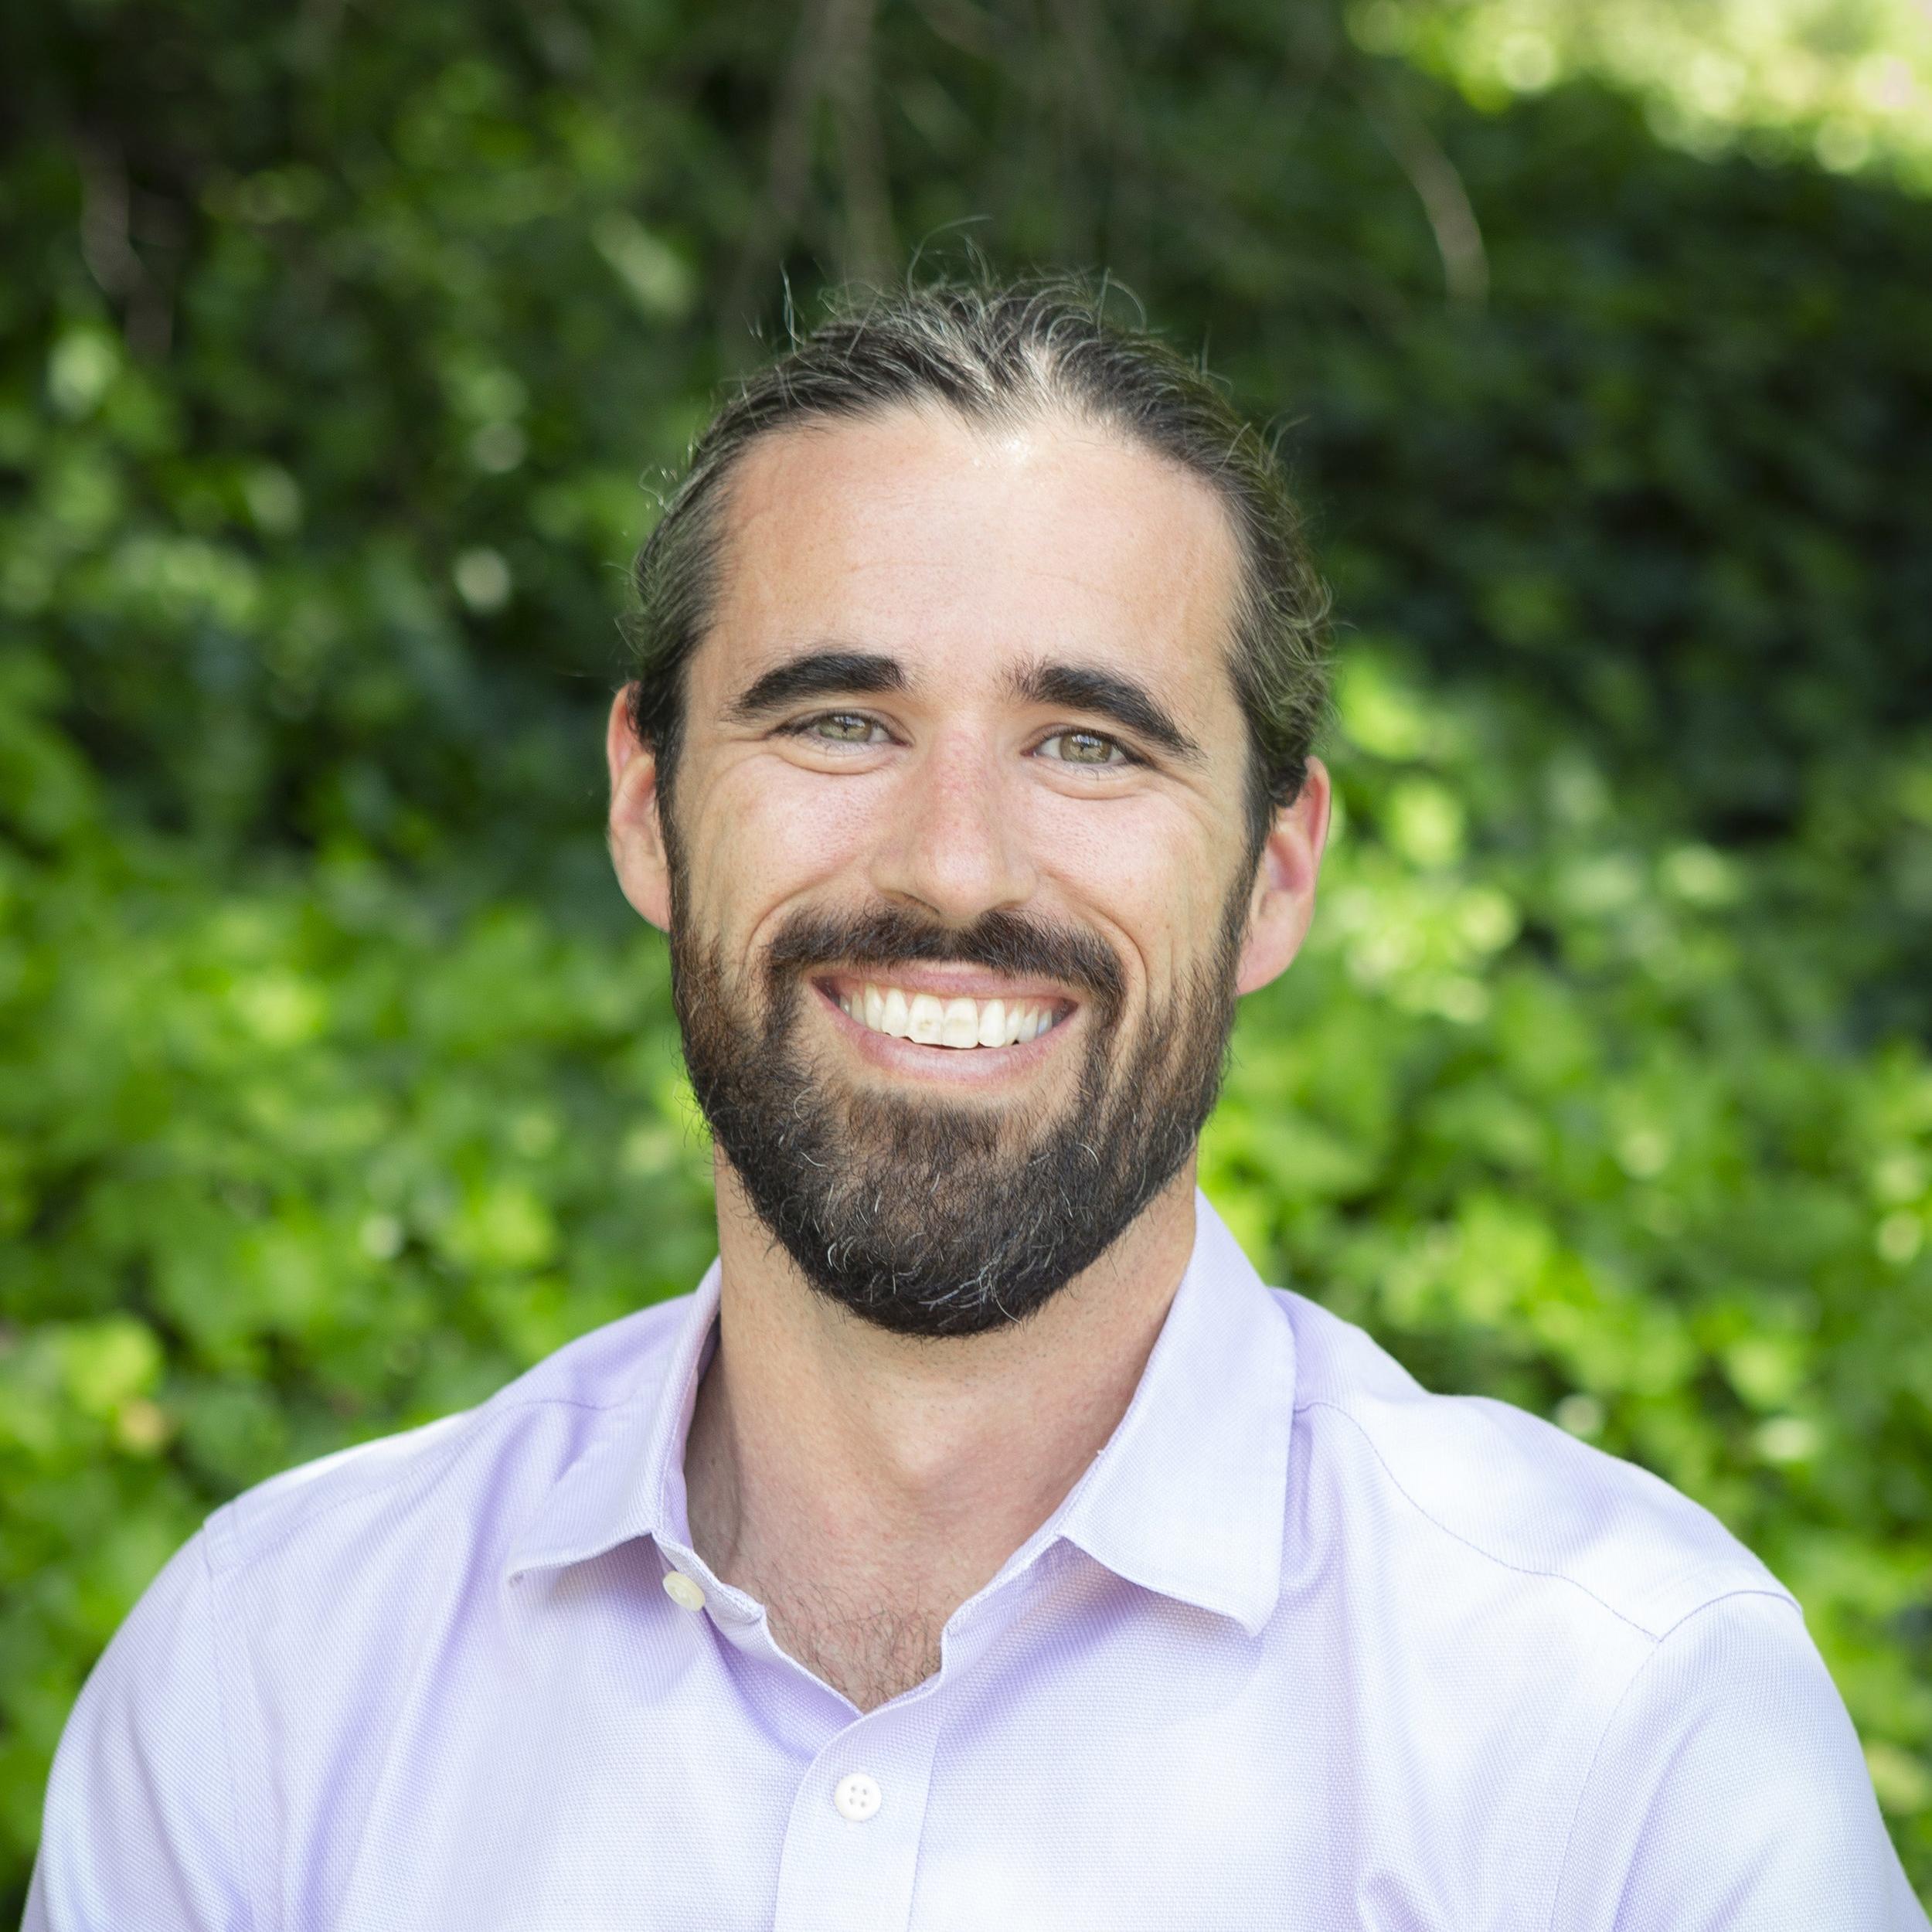 Jeremy L. Sackett - Founder & CSO